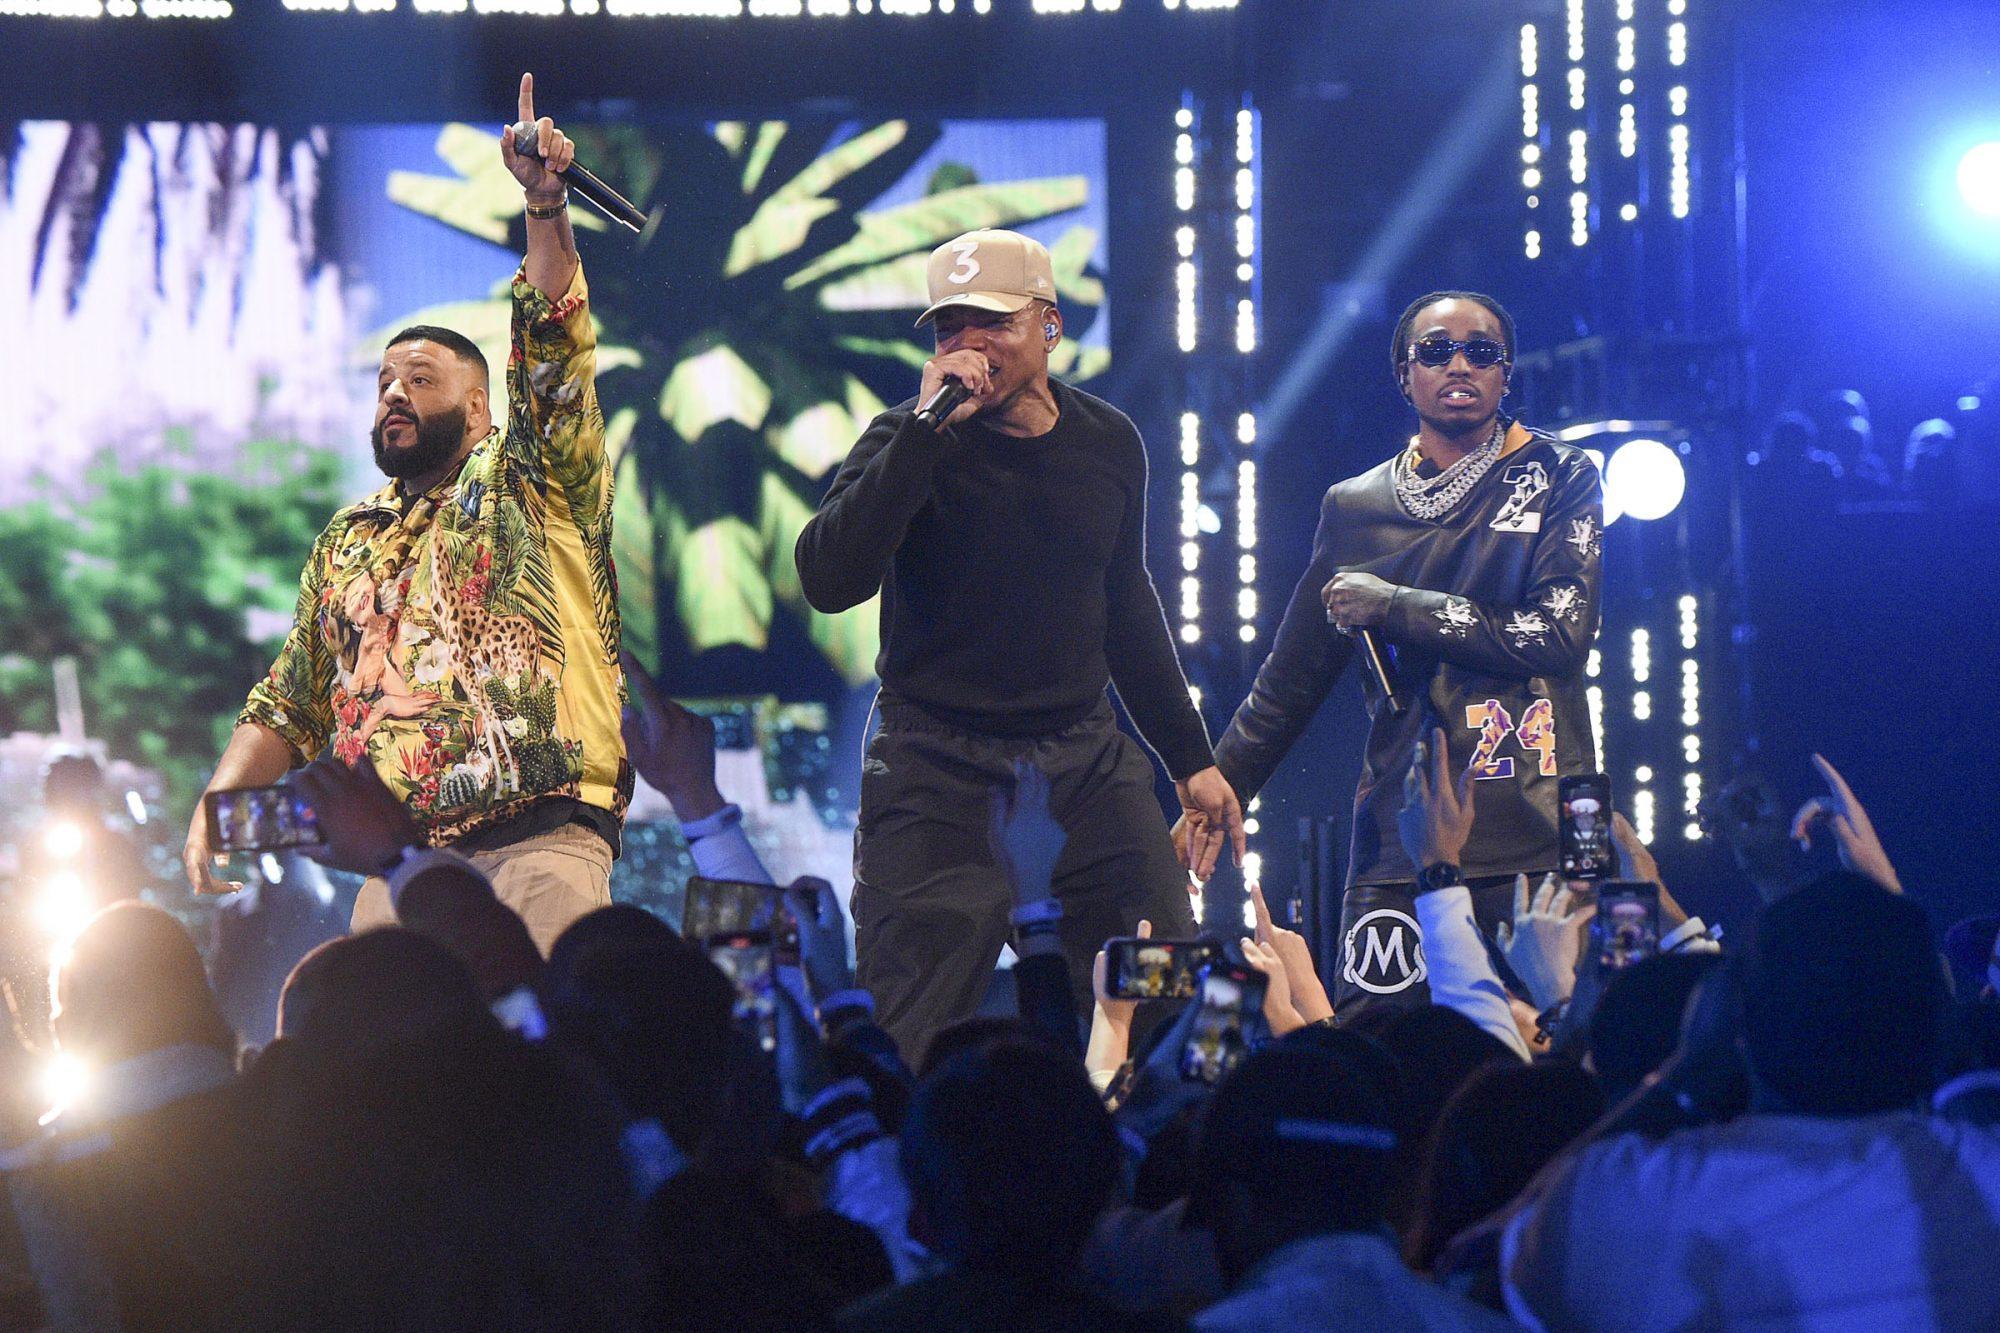 DJ Khaled, Chance the Rapper, and Quavo